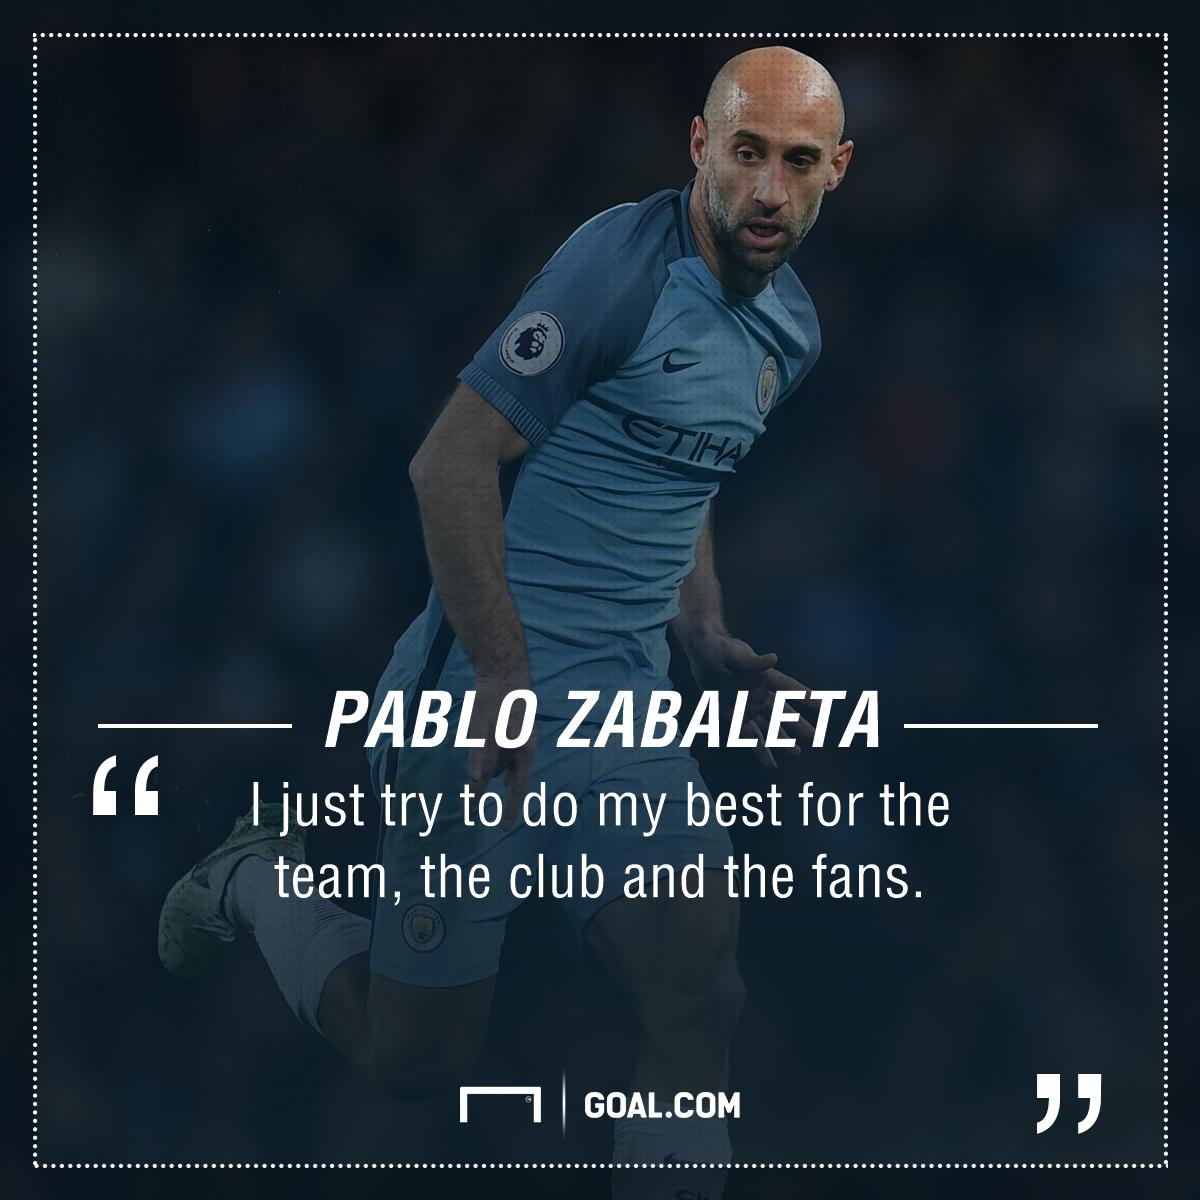 Pablo Zabaleta Manchester City PS